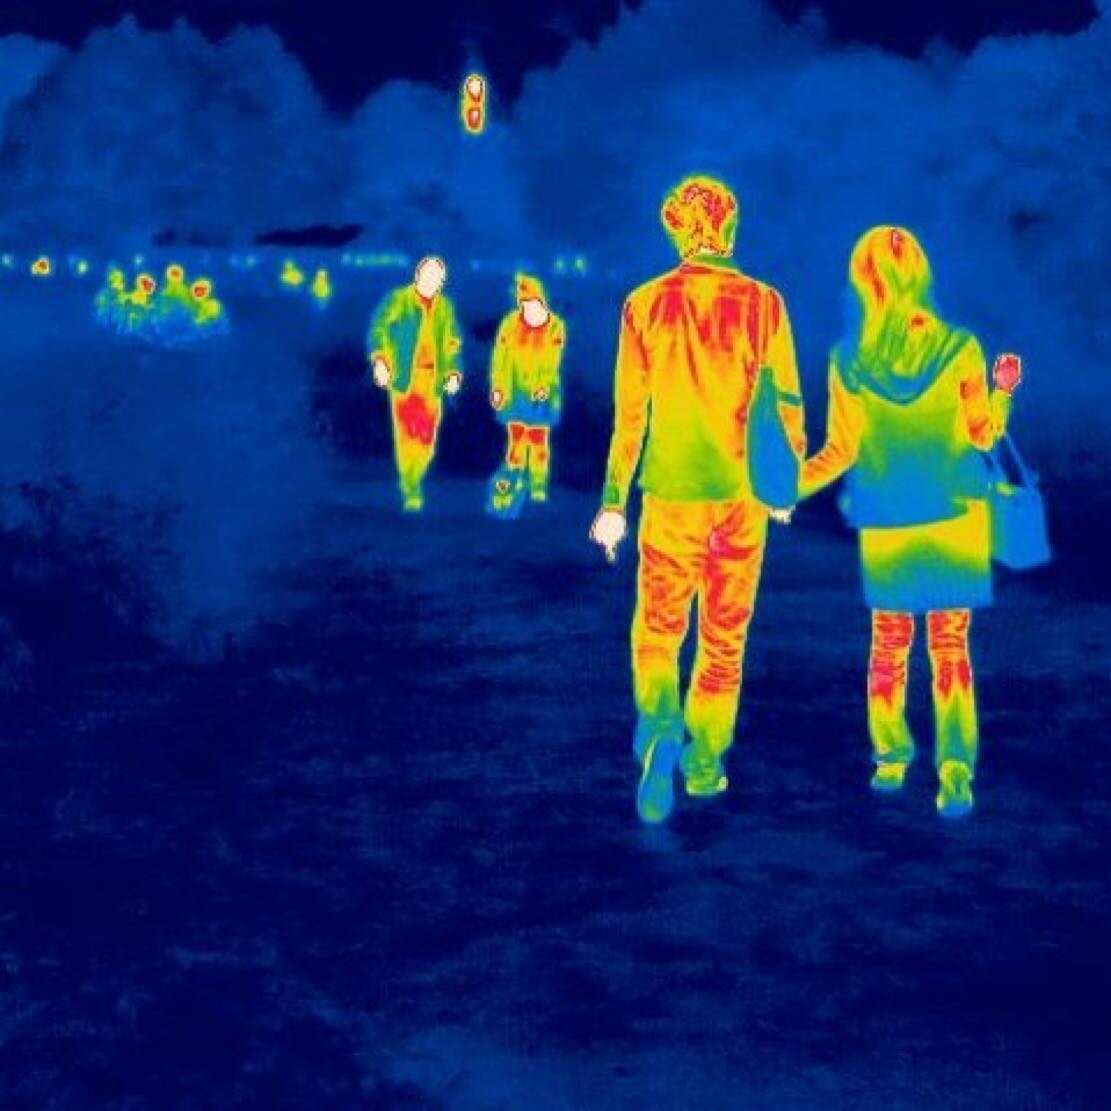 Сотрудникам предприятия во Владимире измеряют температуру тепловизором